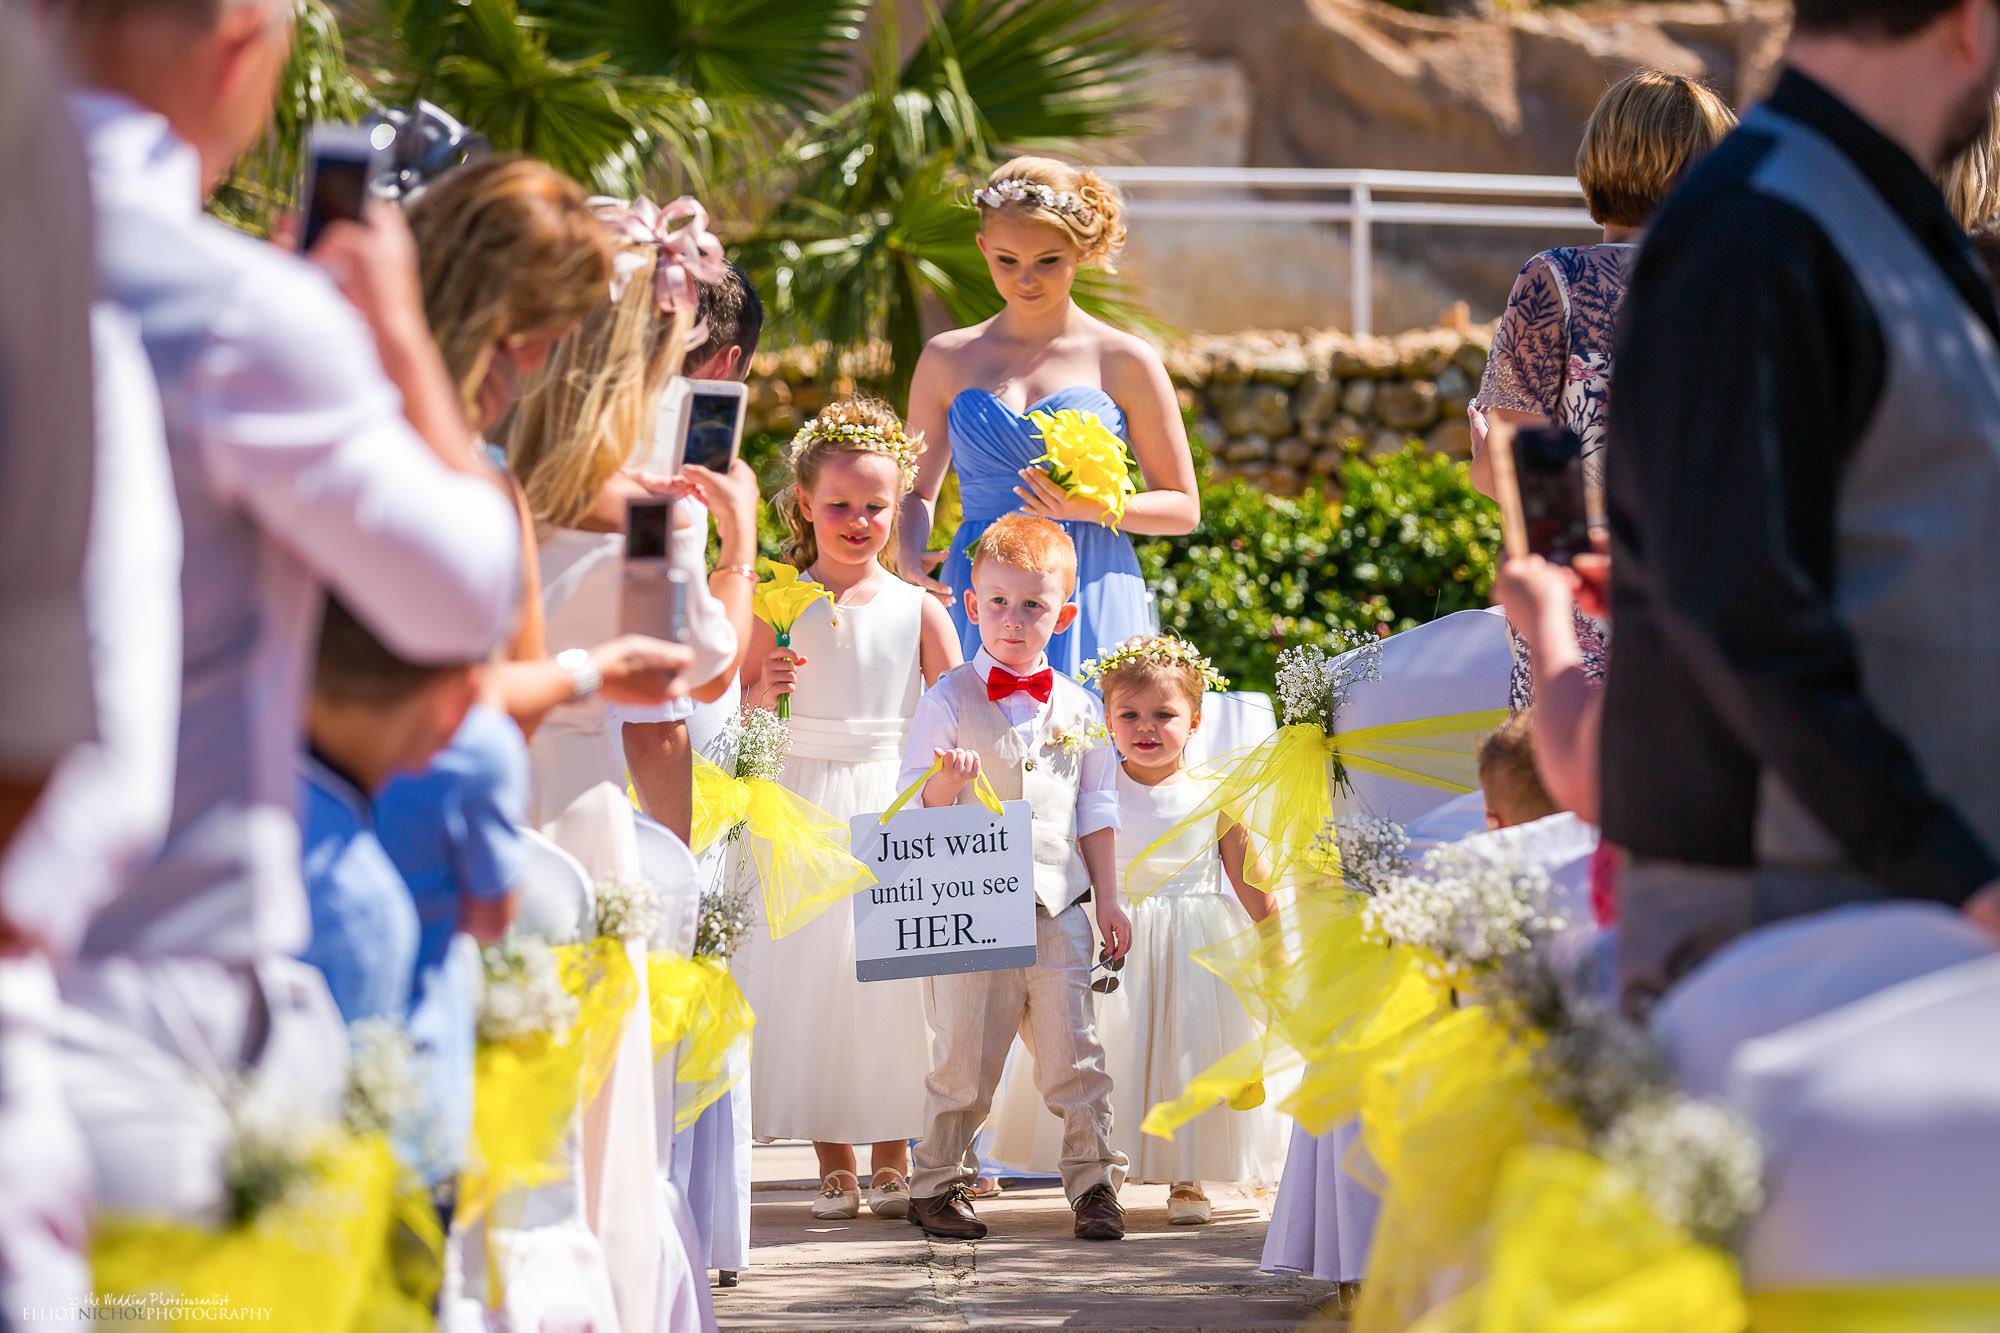 pageboy-flower-girl-procession-wedding-ceremony